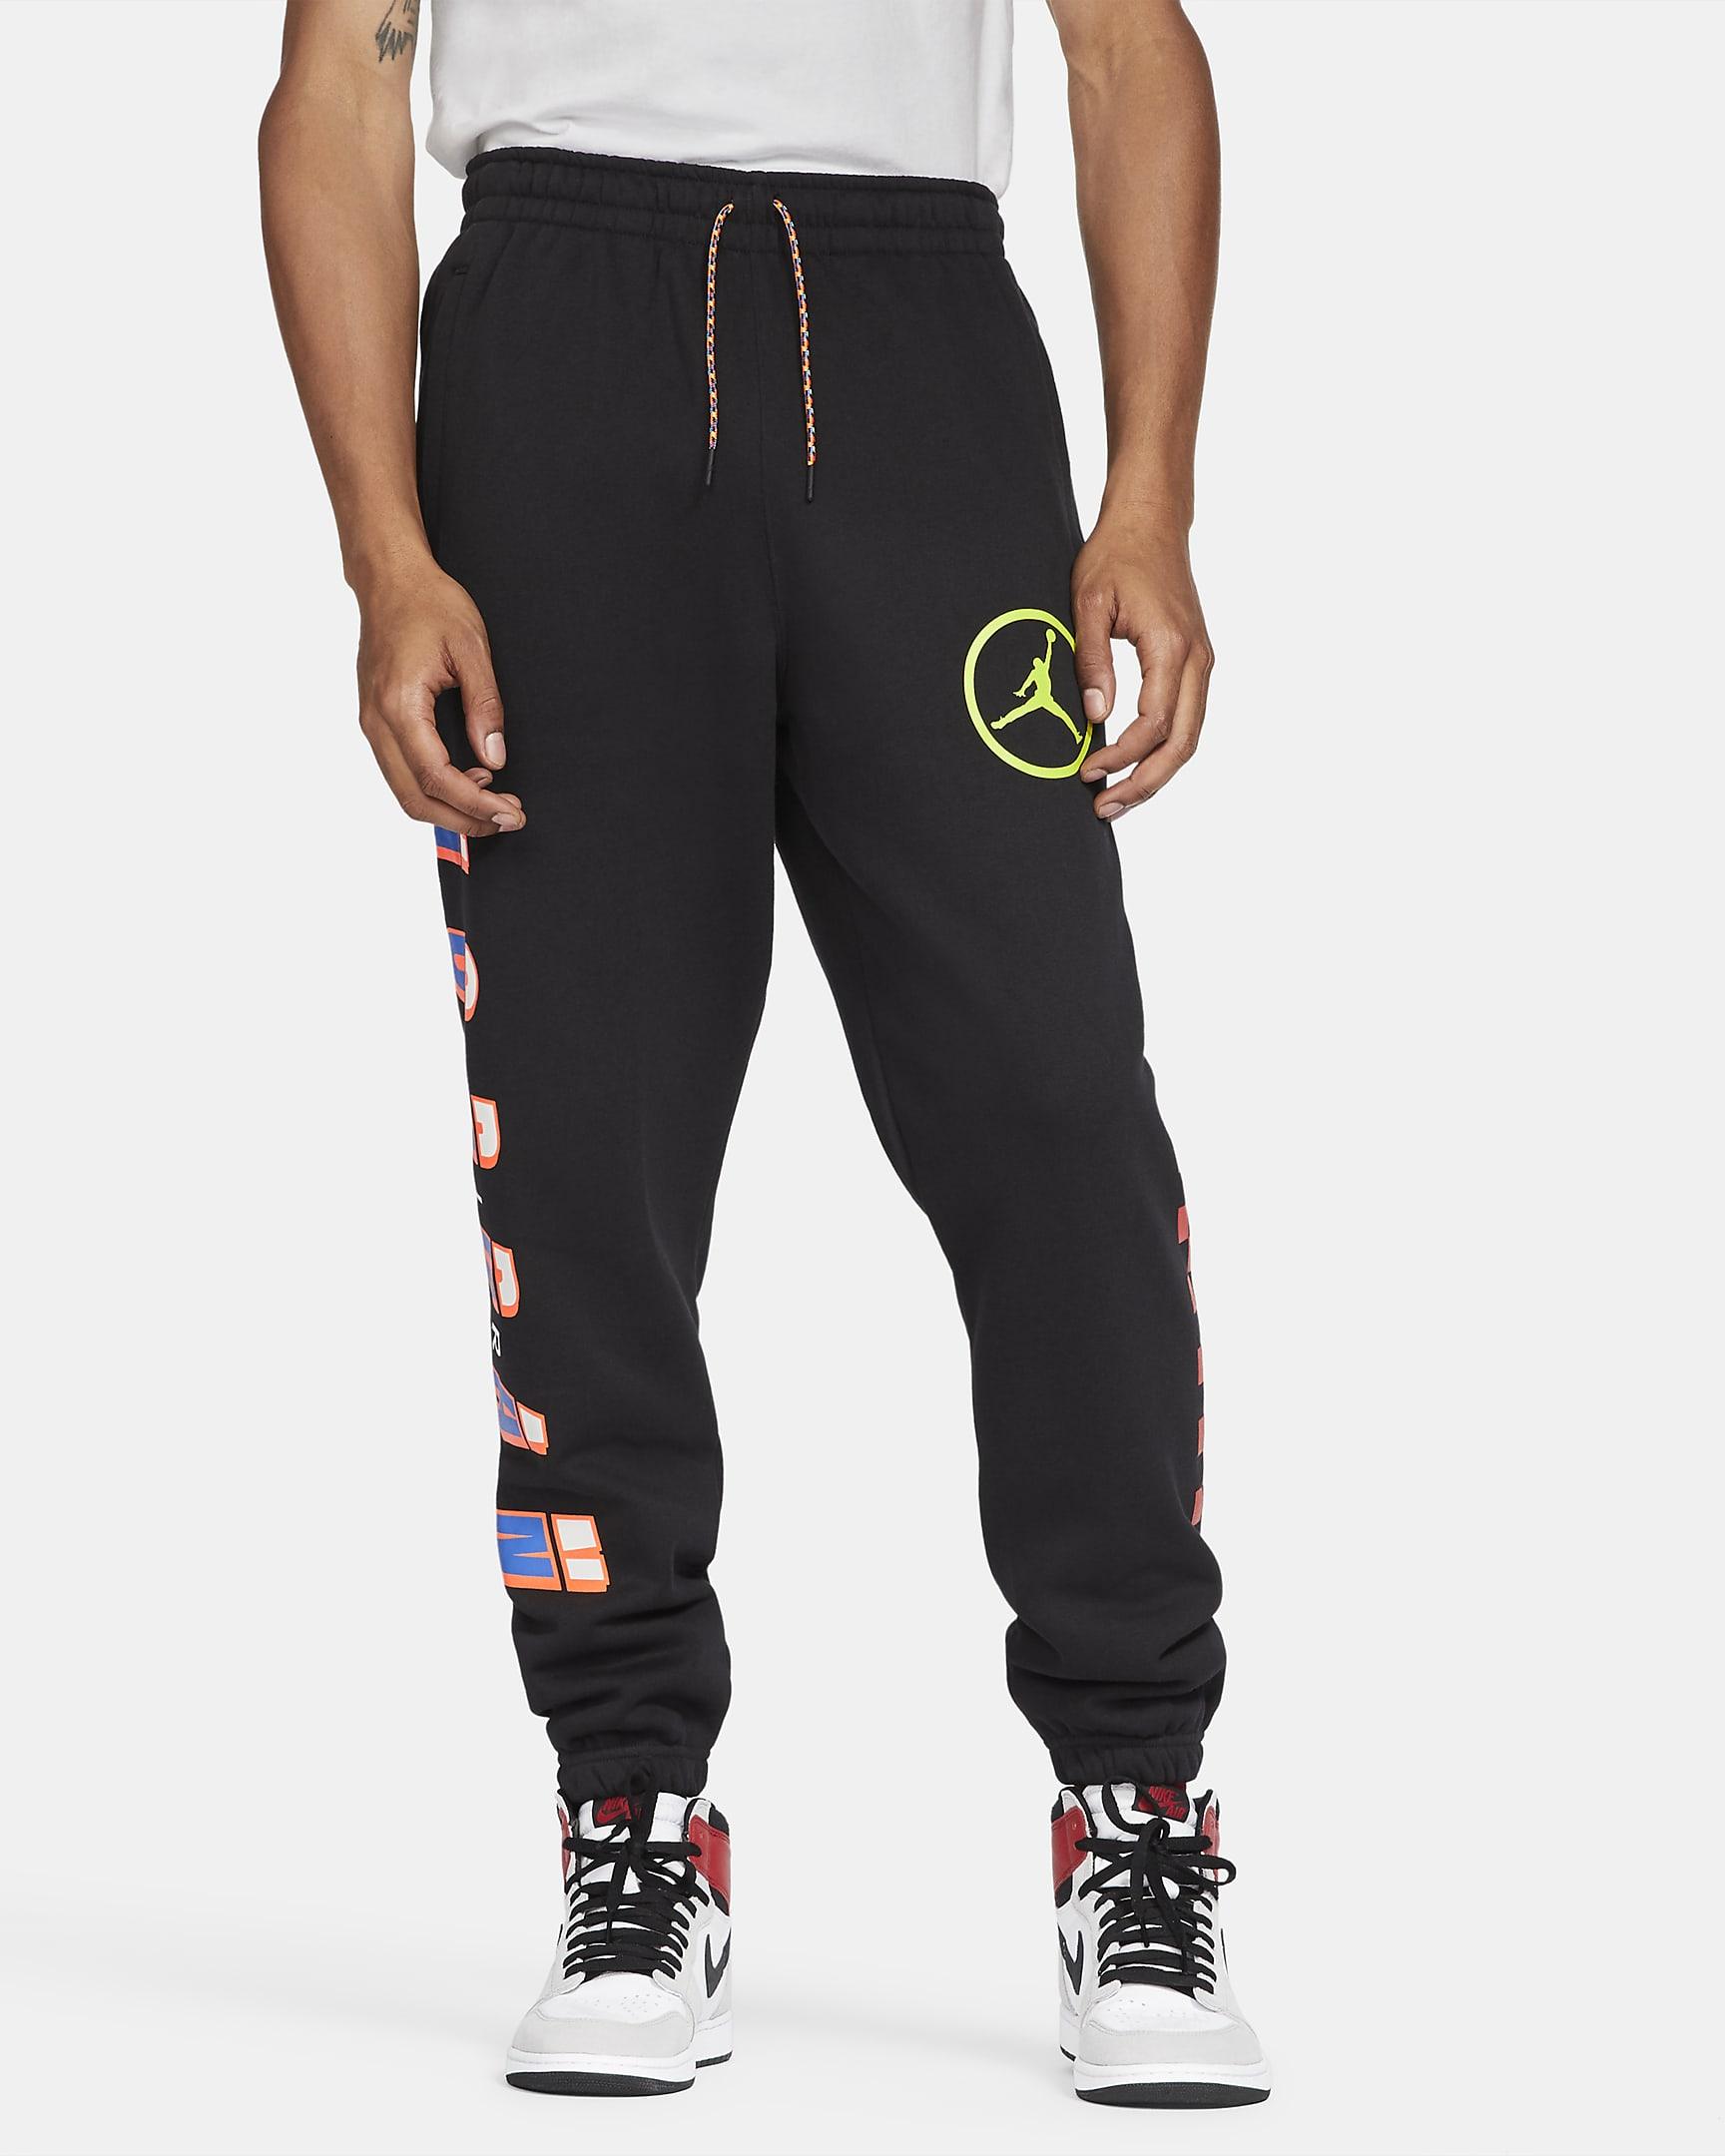 jordan-sport-dna-mens-fleece-pants-k7jS82-1